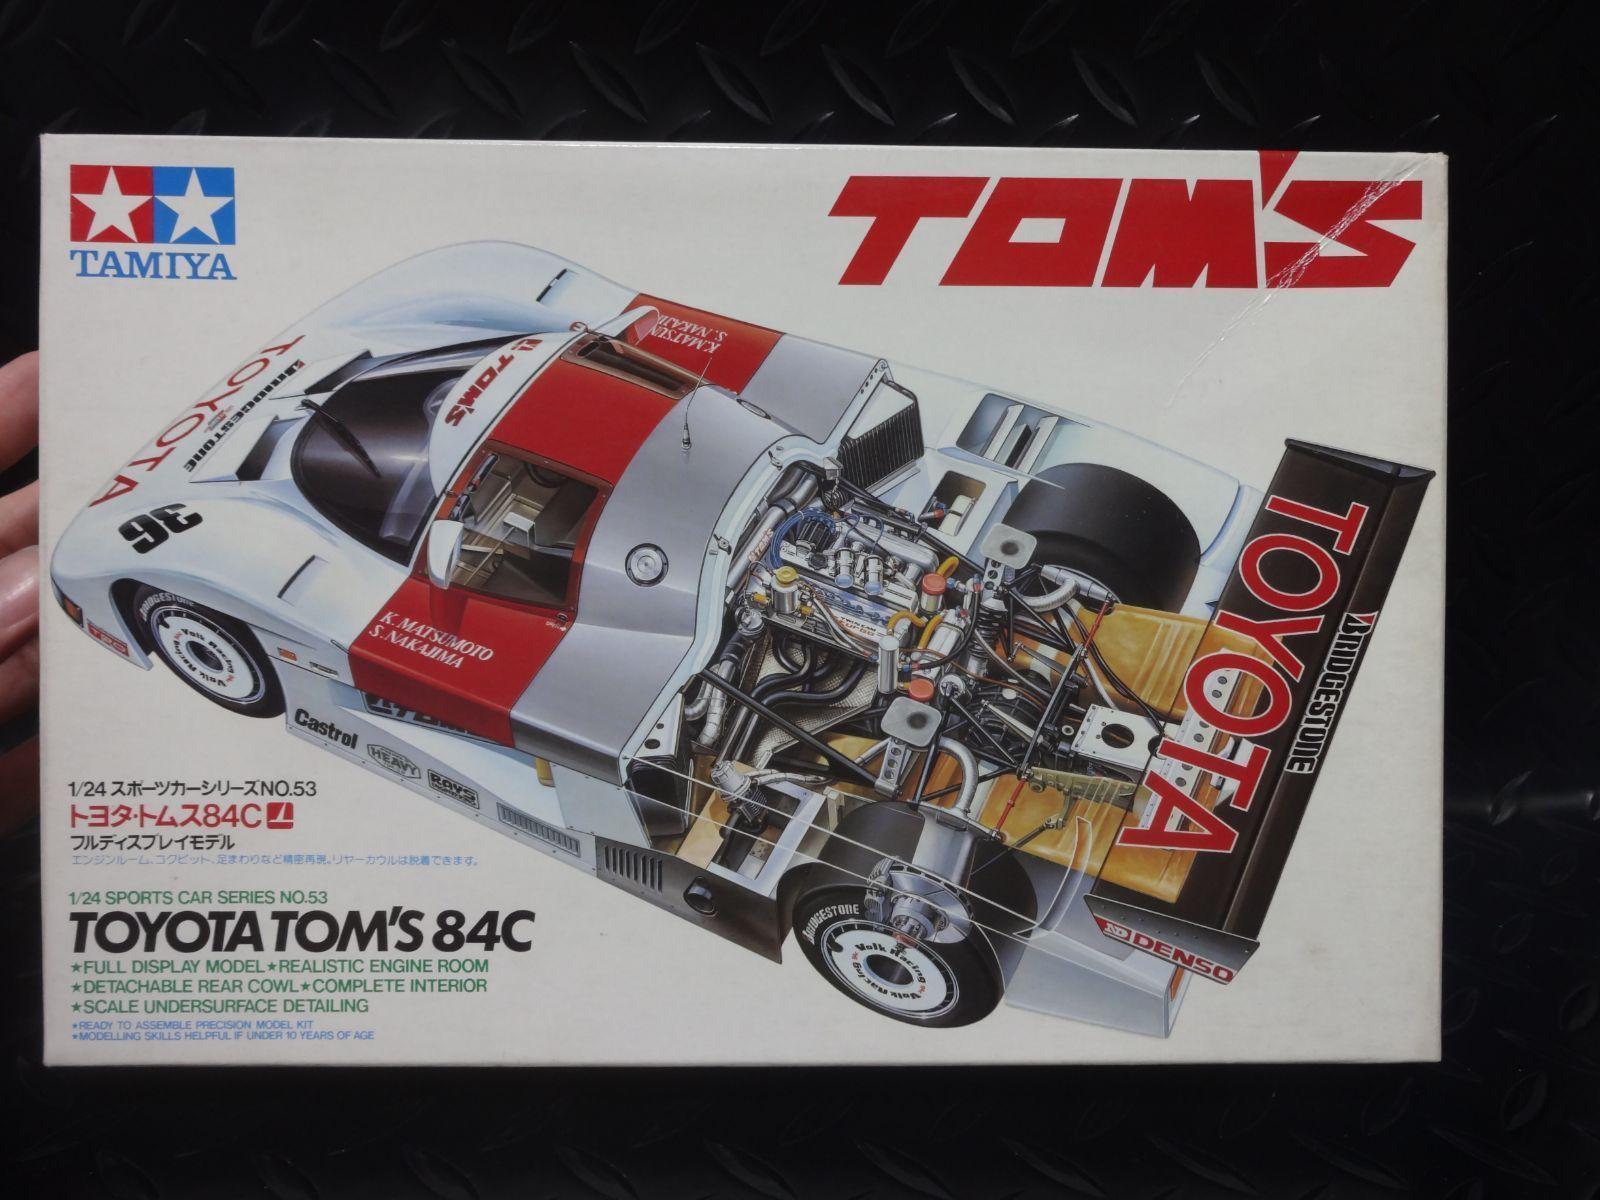 ec8792705135879d6589e33c1c86fddb Breathtaking Tamiya Porsche 911 Gt1 Full View Cars Trend